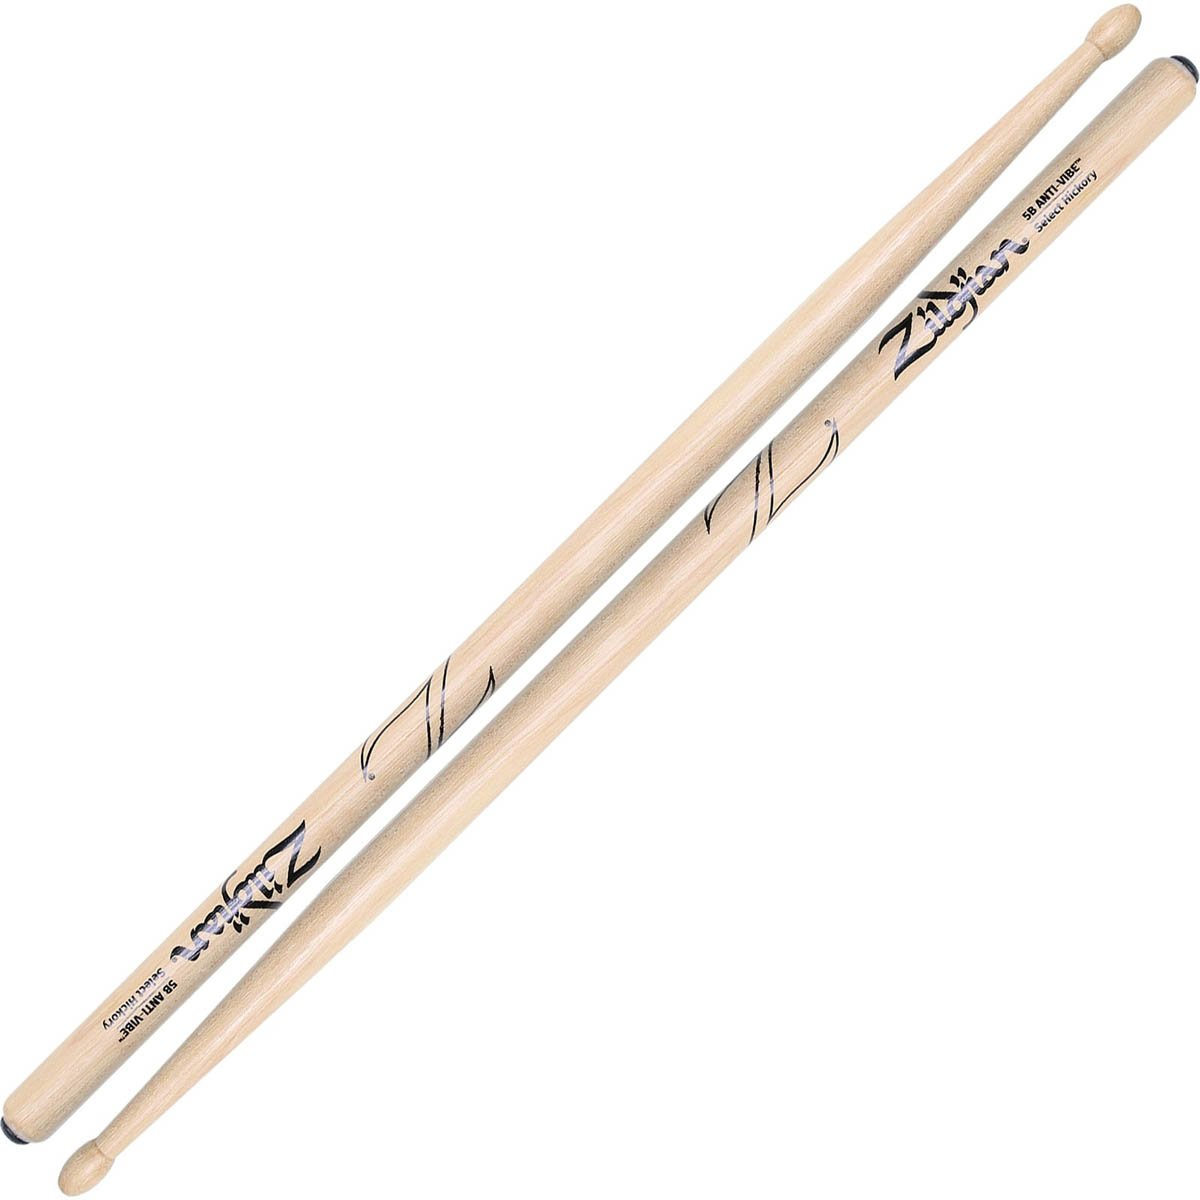 Zildjian 5B Anti-Vibe Hickory Drum Stick - Wood Tip